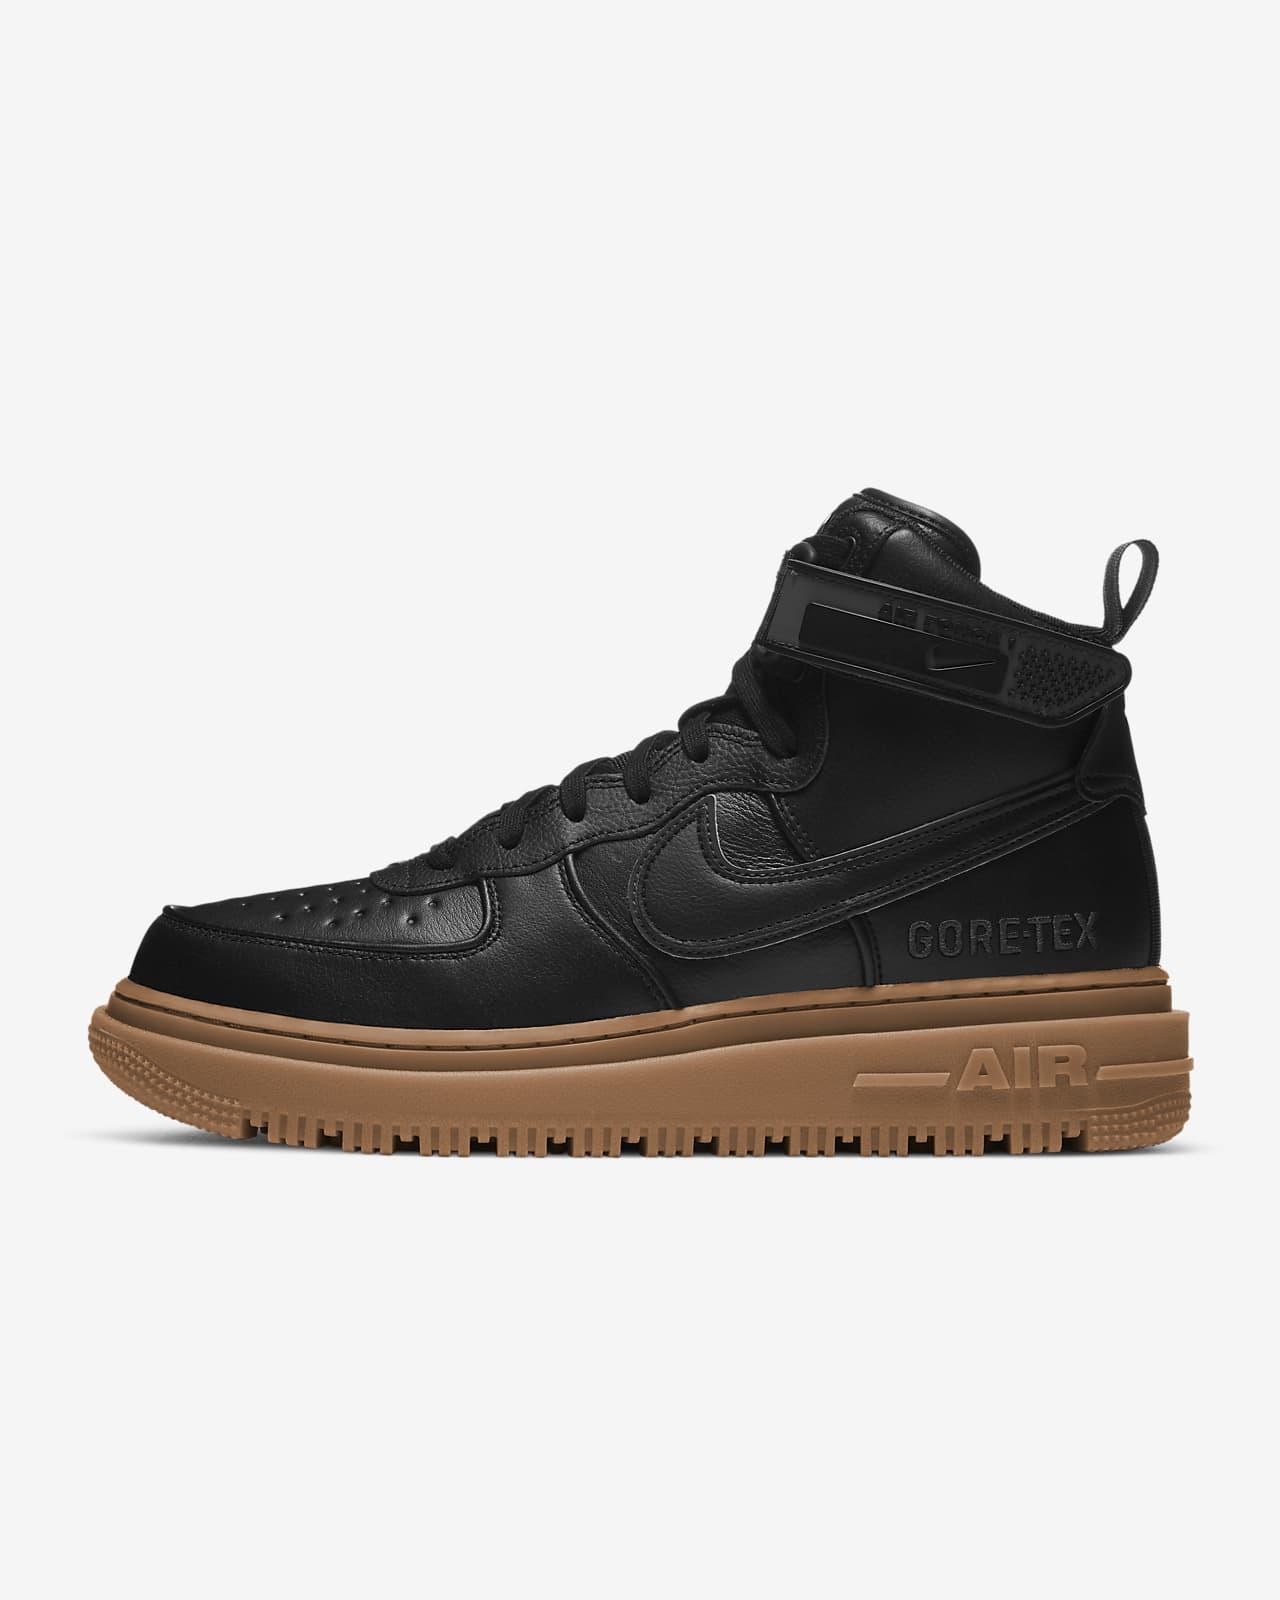 Bota Nike Air Force 1 GTX Boot